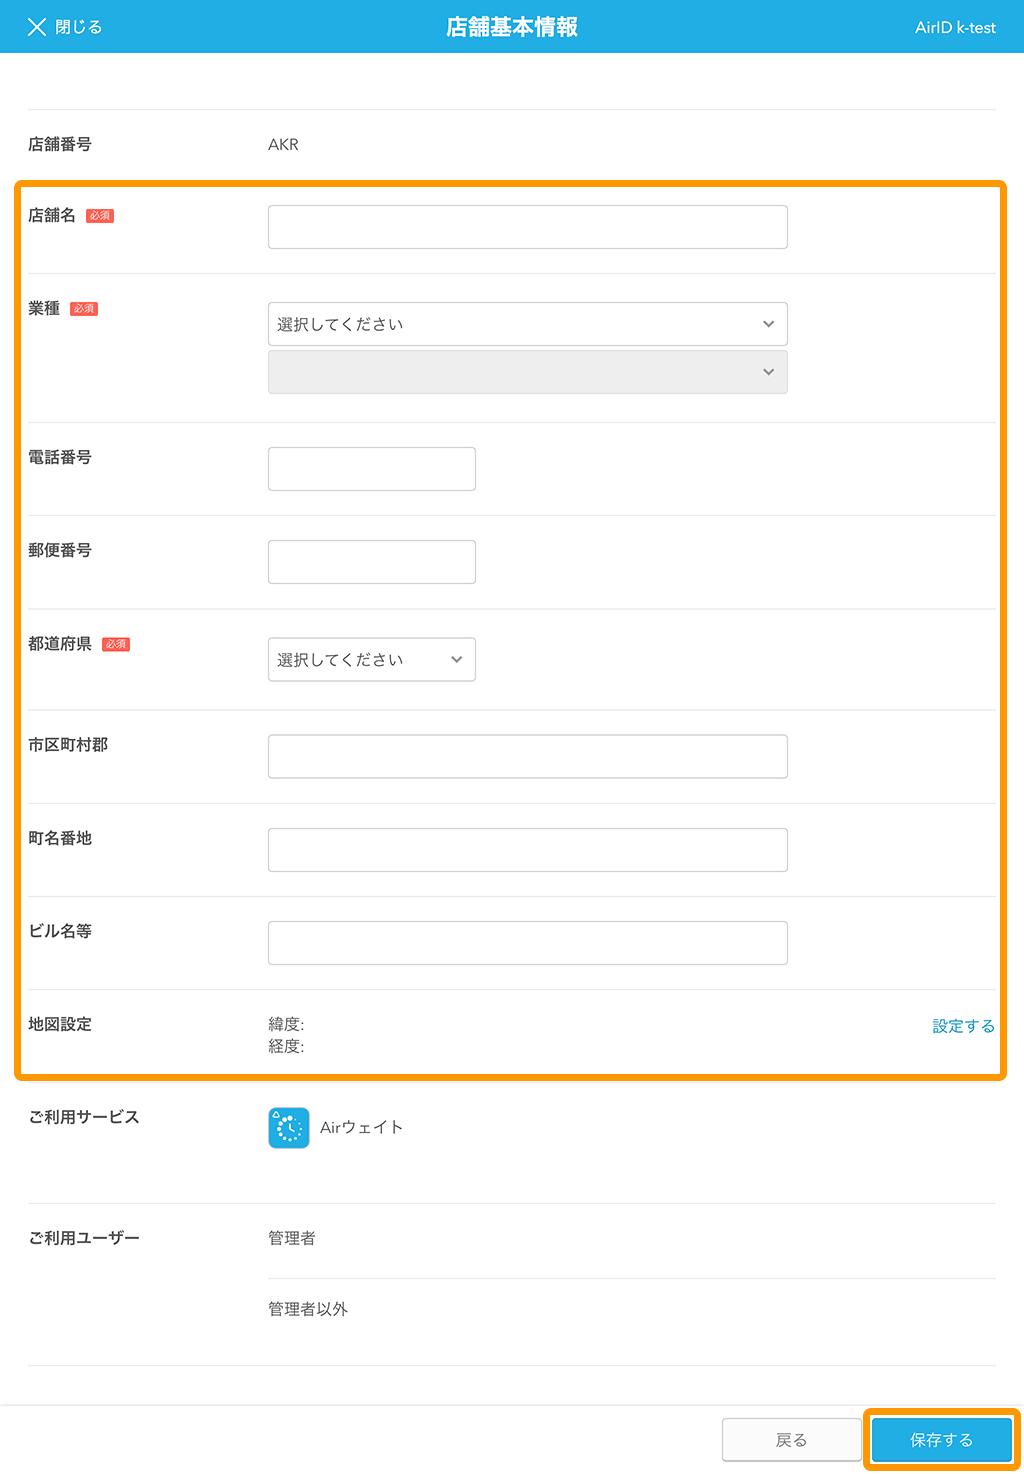 Airウェイト 管理者メニュー 基本情報 店舗基本情報画面